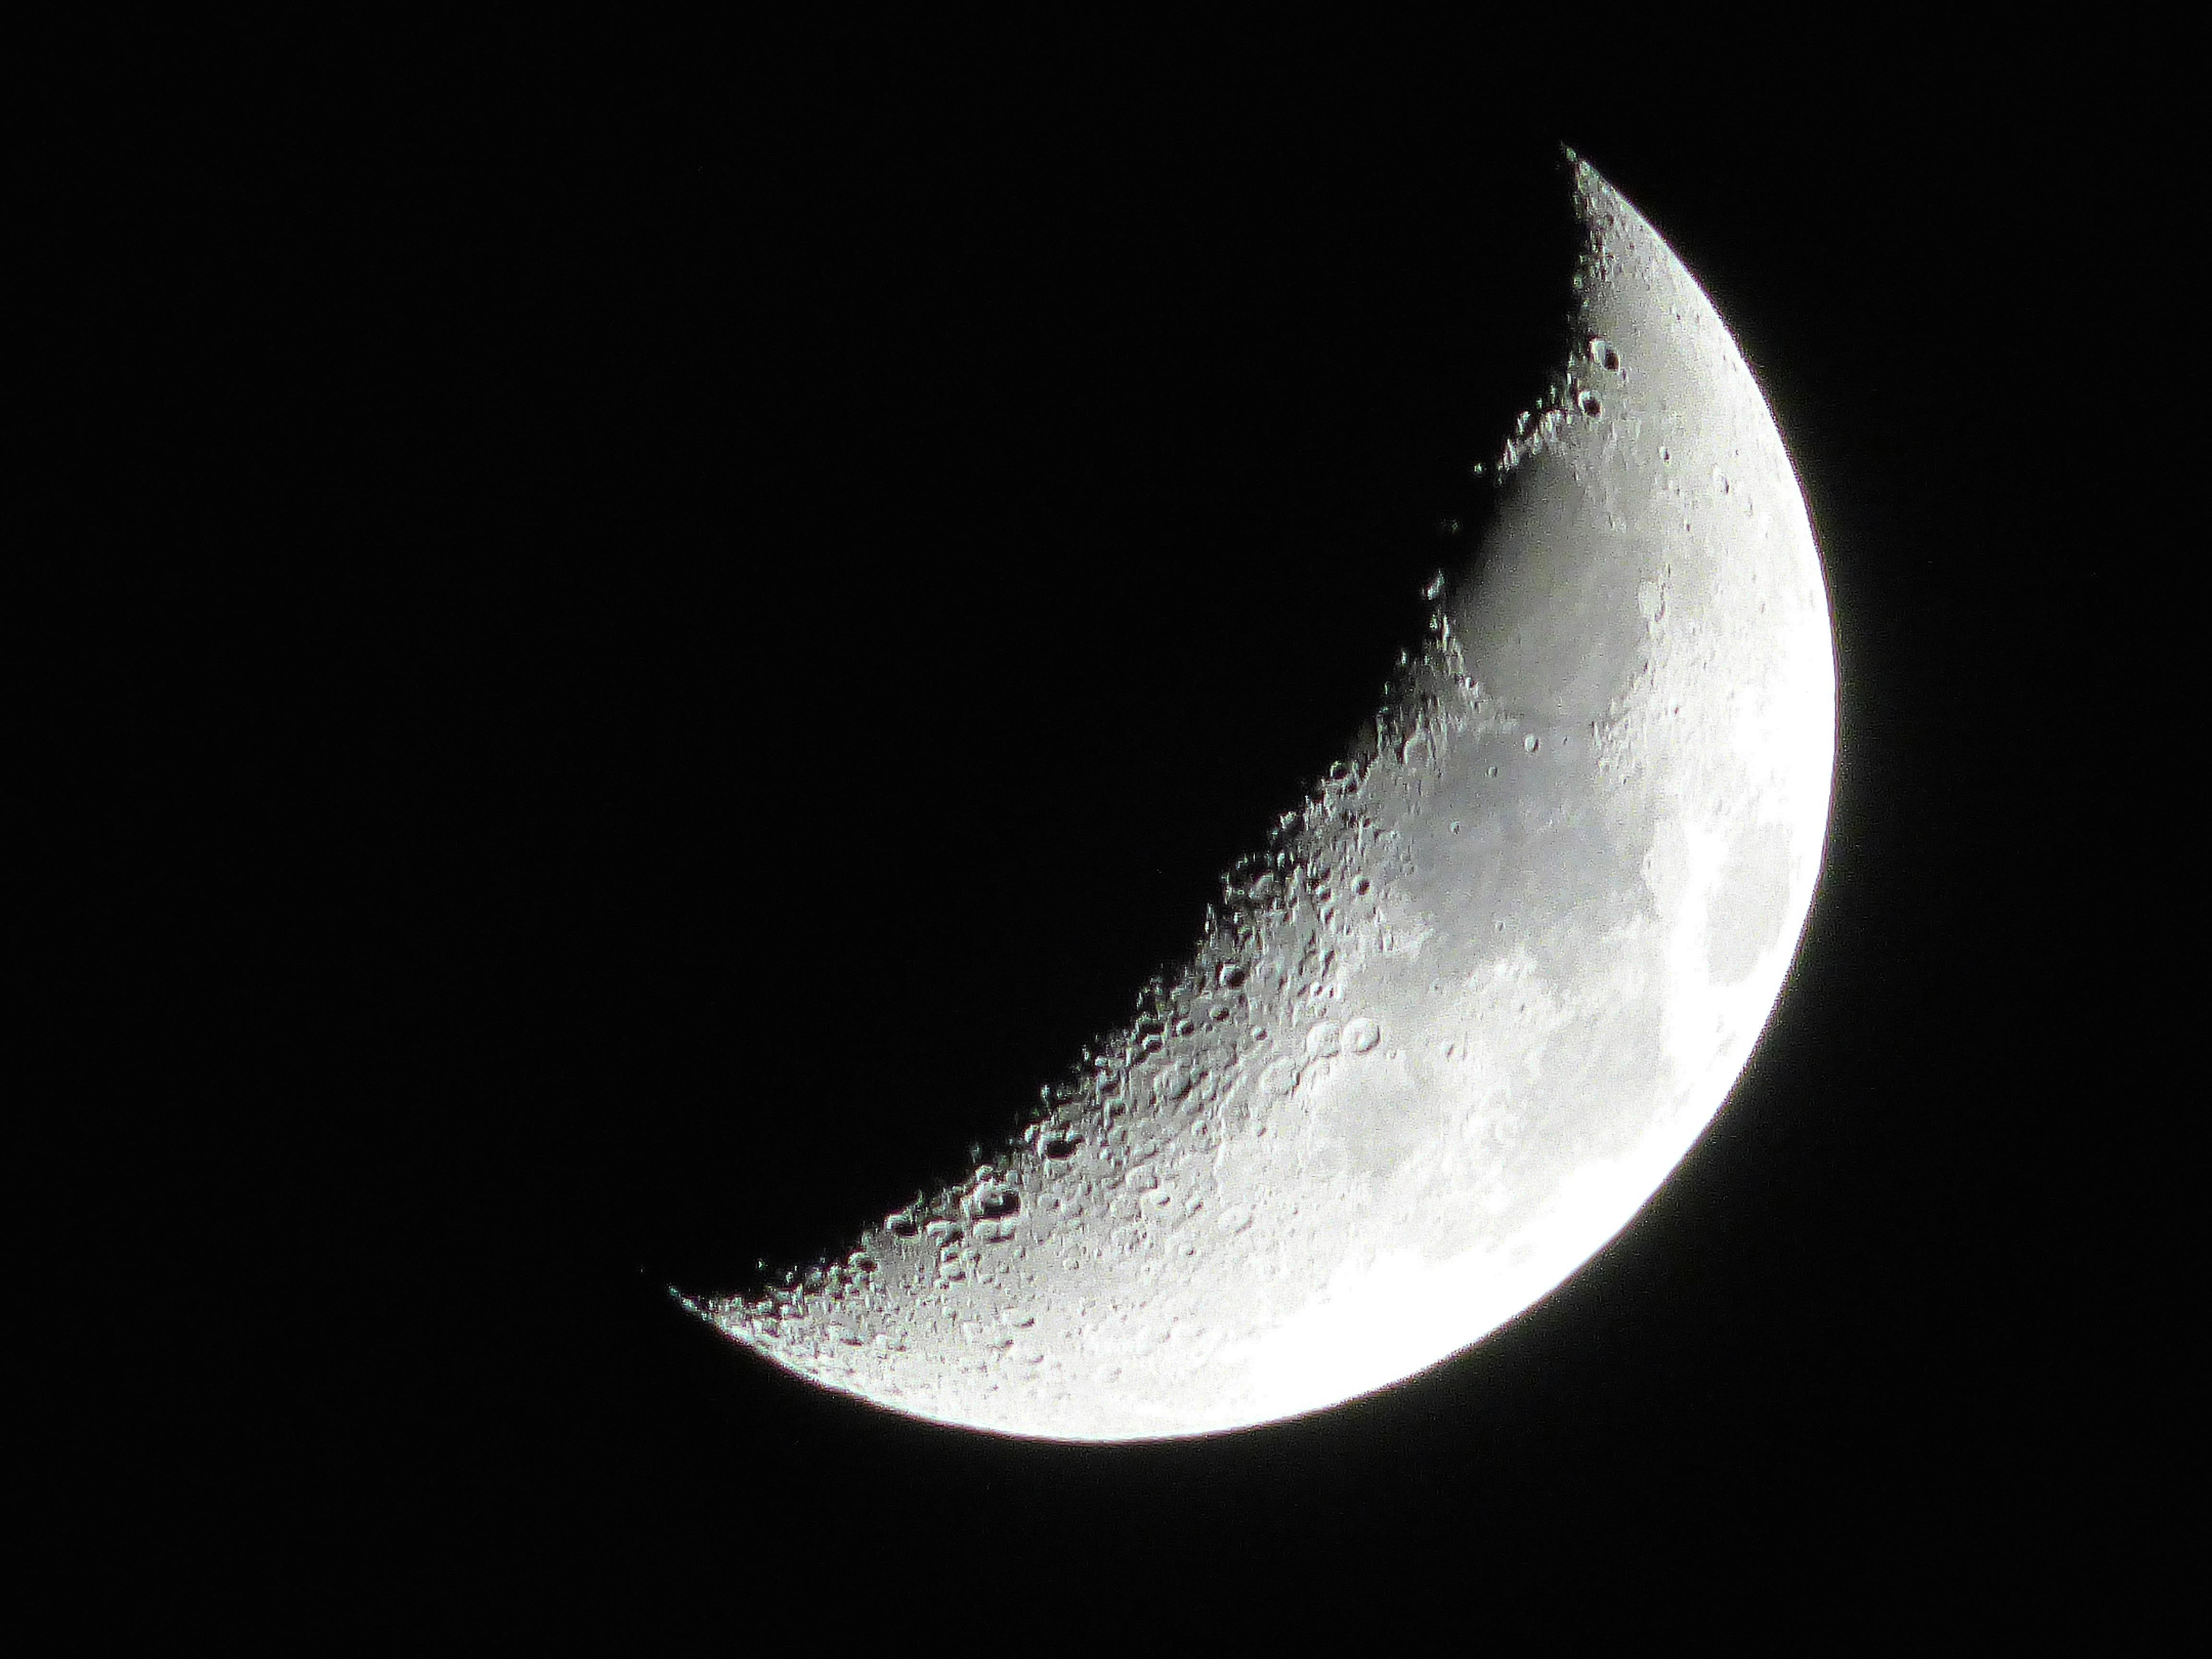 File:Waxing crescent moon.jpg - Wikimedia Commons